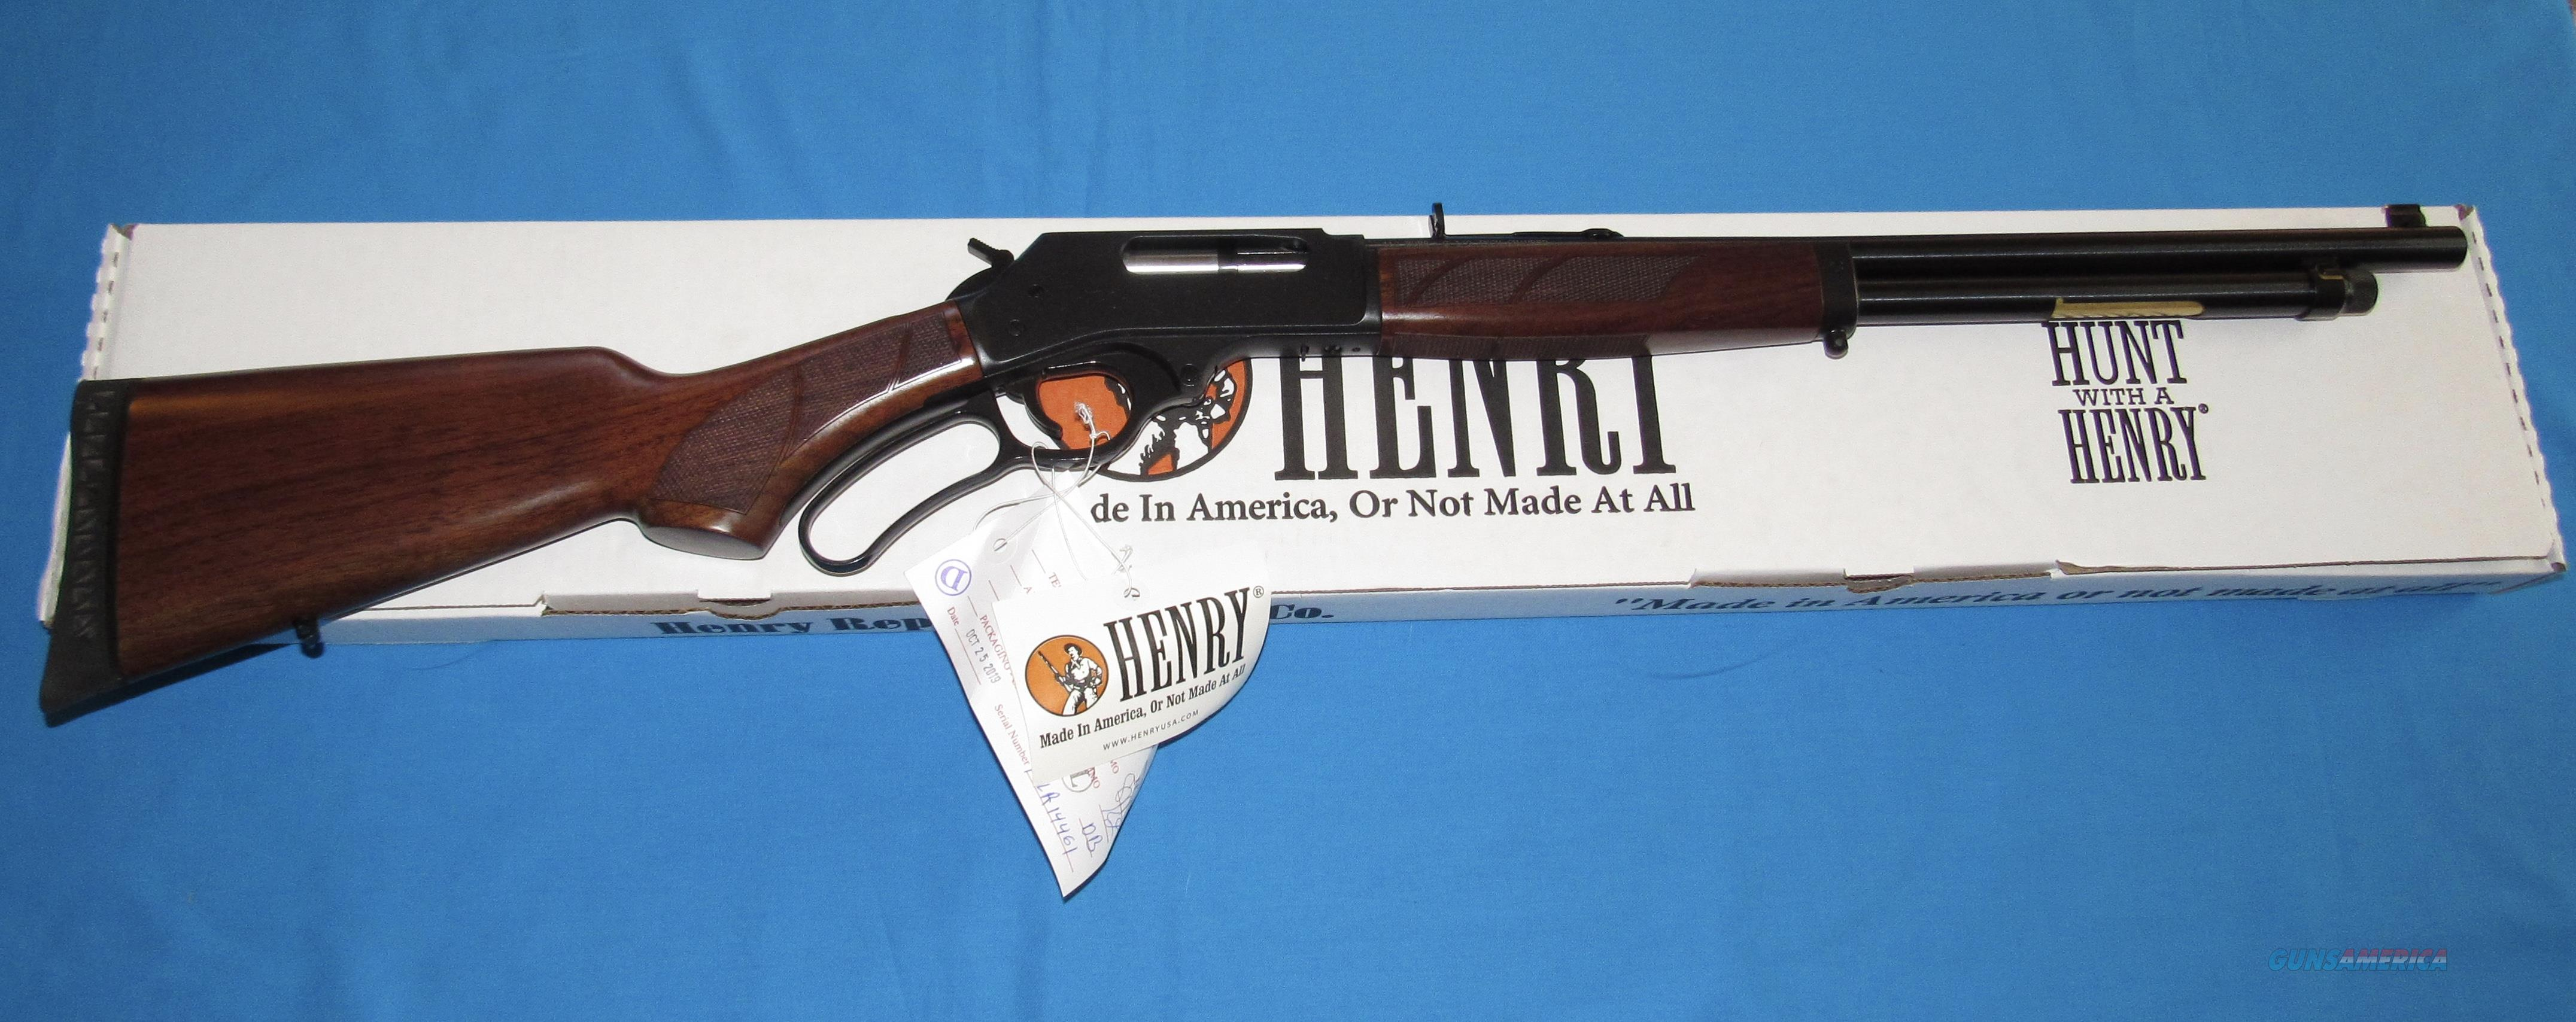 HENRY 410 GAUGE LEVER ACTION SHOTGUN  Guns > Shotguns > Henry Shotguns